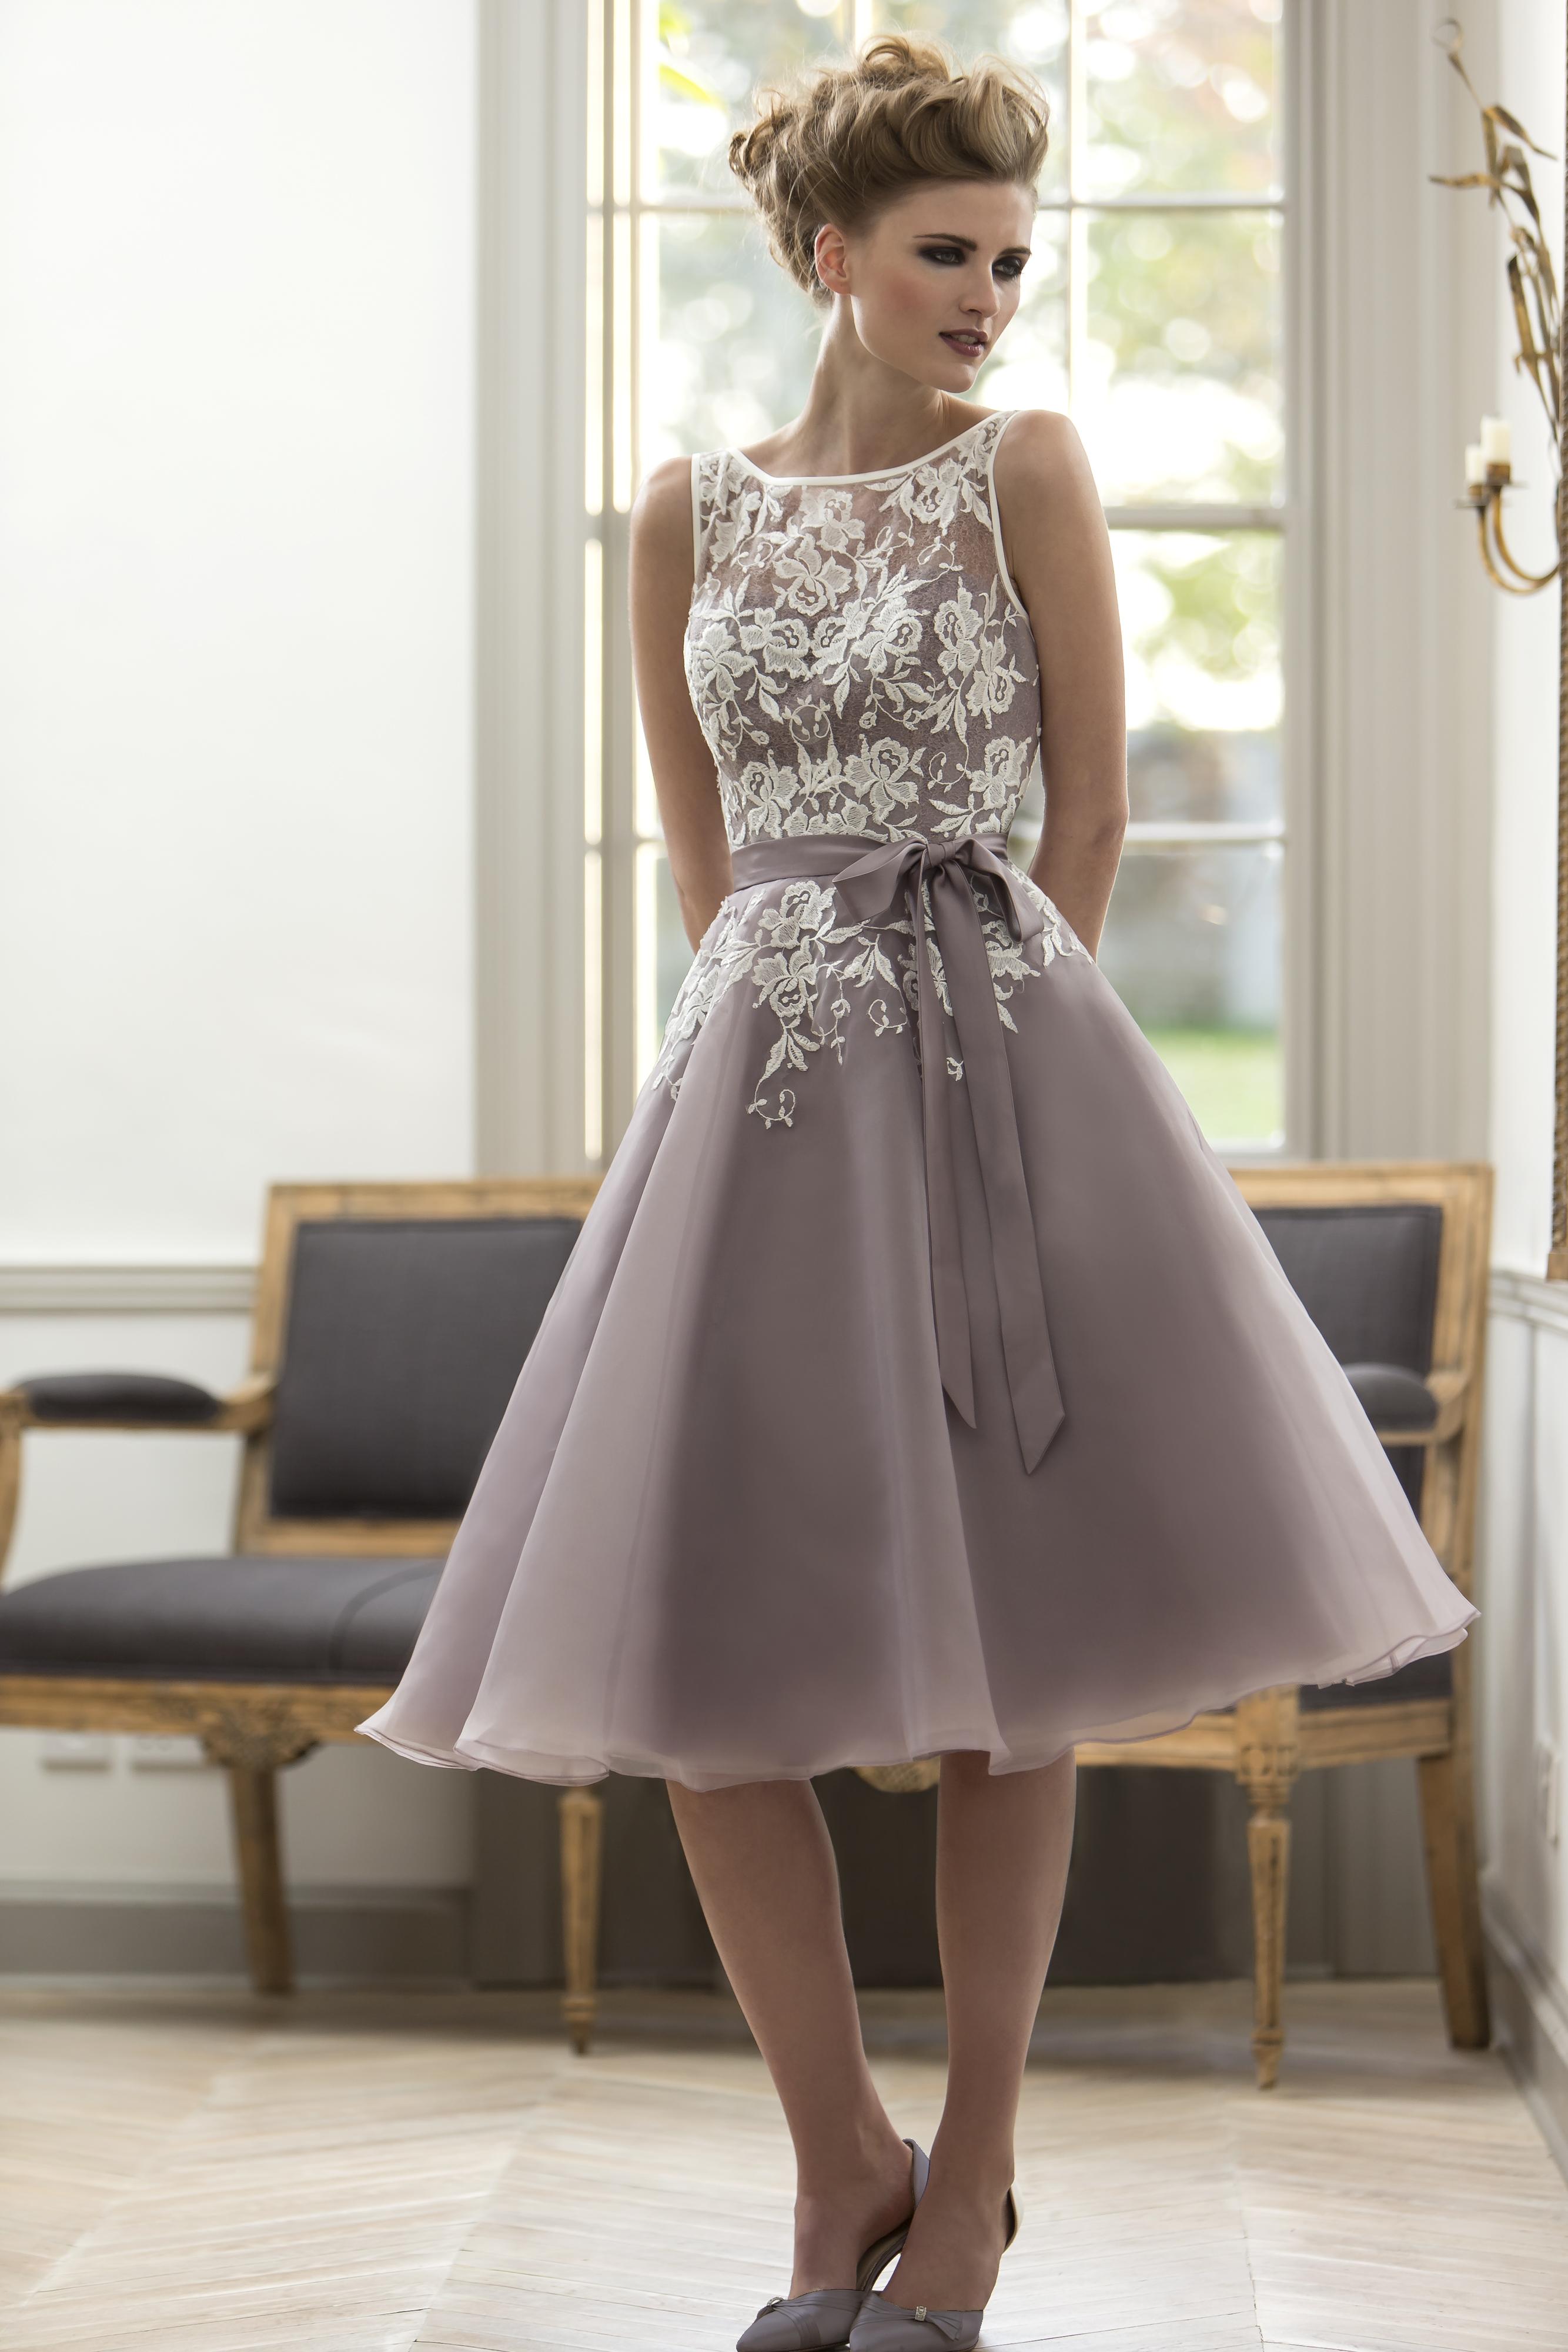 Sense of Style – True Bridesmaids